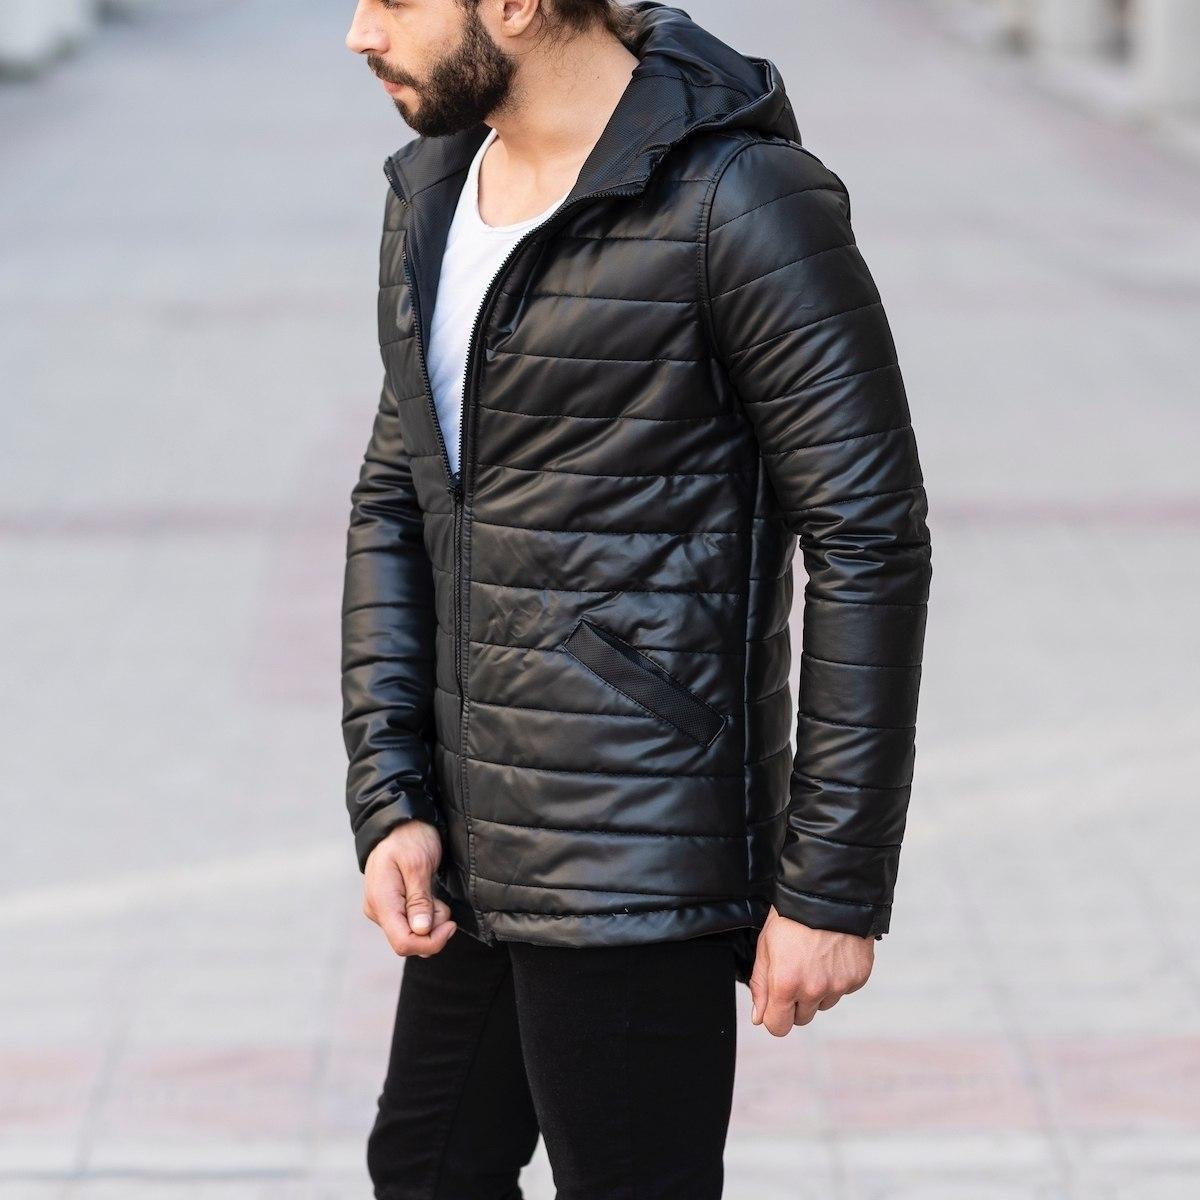 Hooded Long Jacket MV Jacket Collection - 3